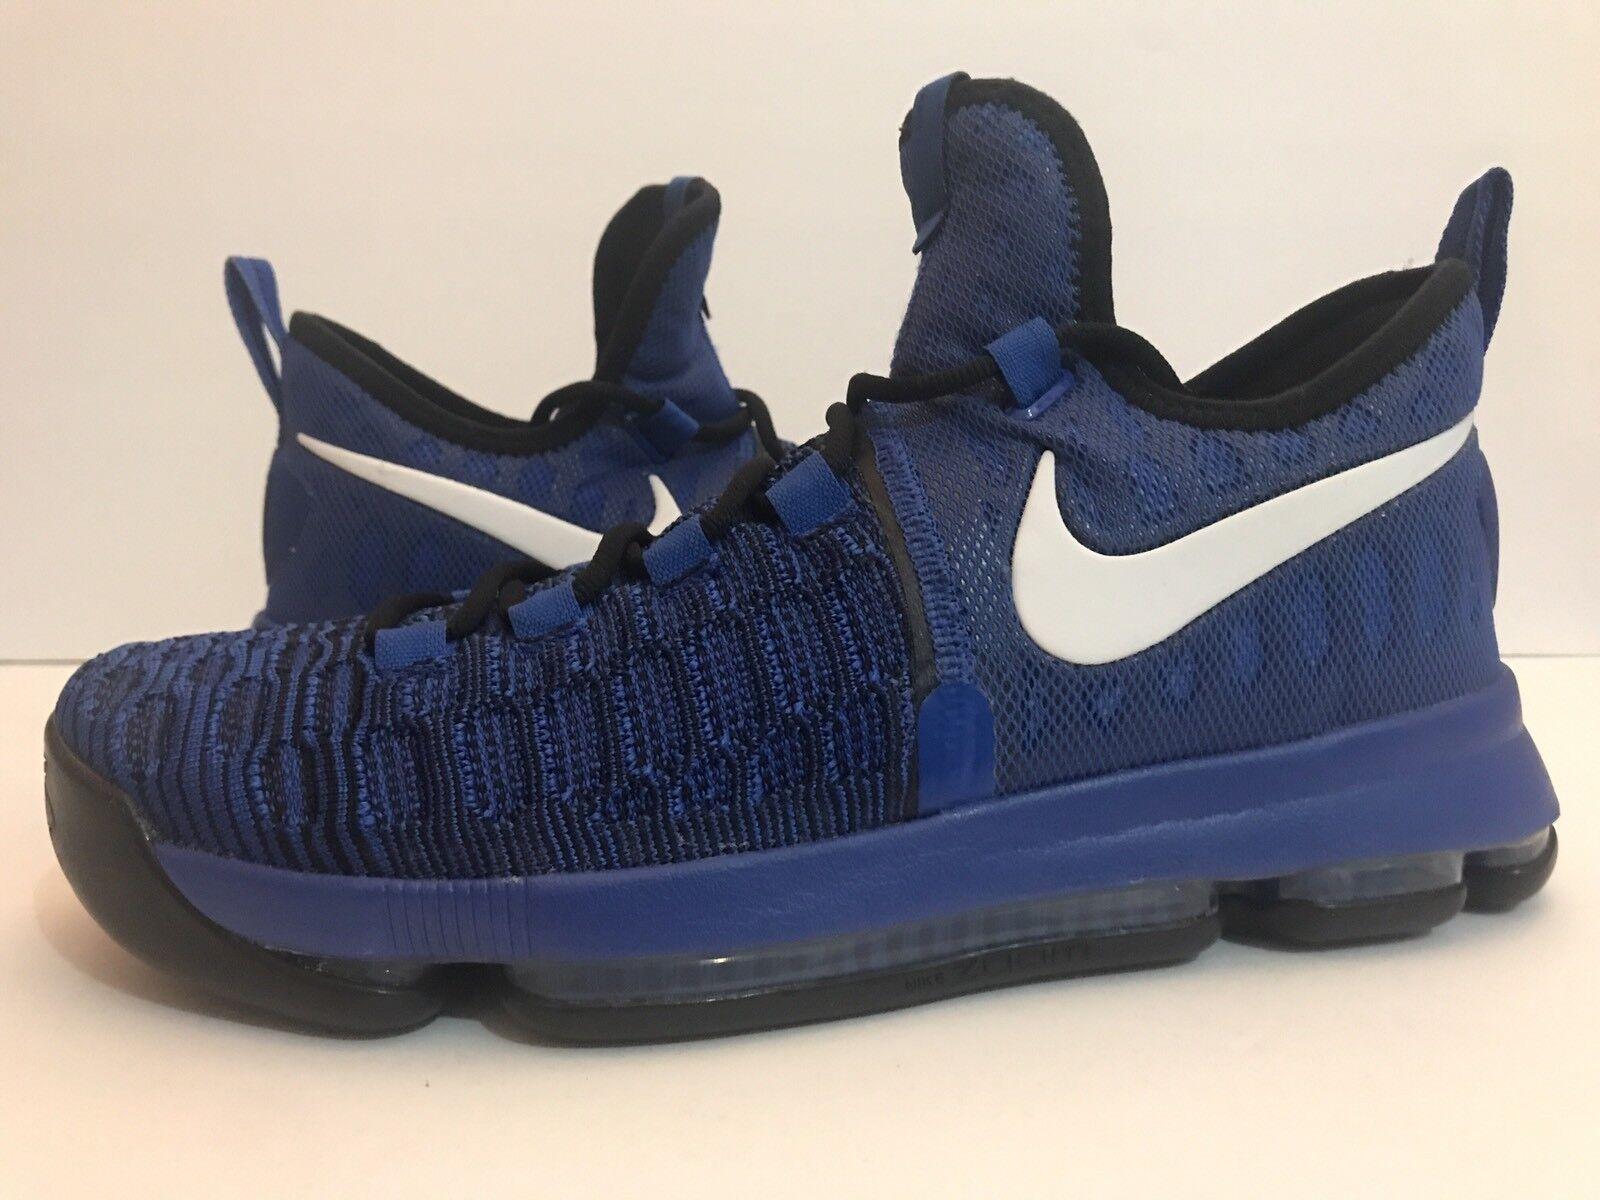 Nike Zoom Air KD On Court FlyKnit Warriors  843392-410 Sz 10